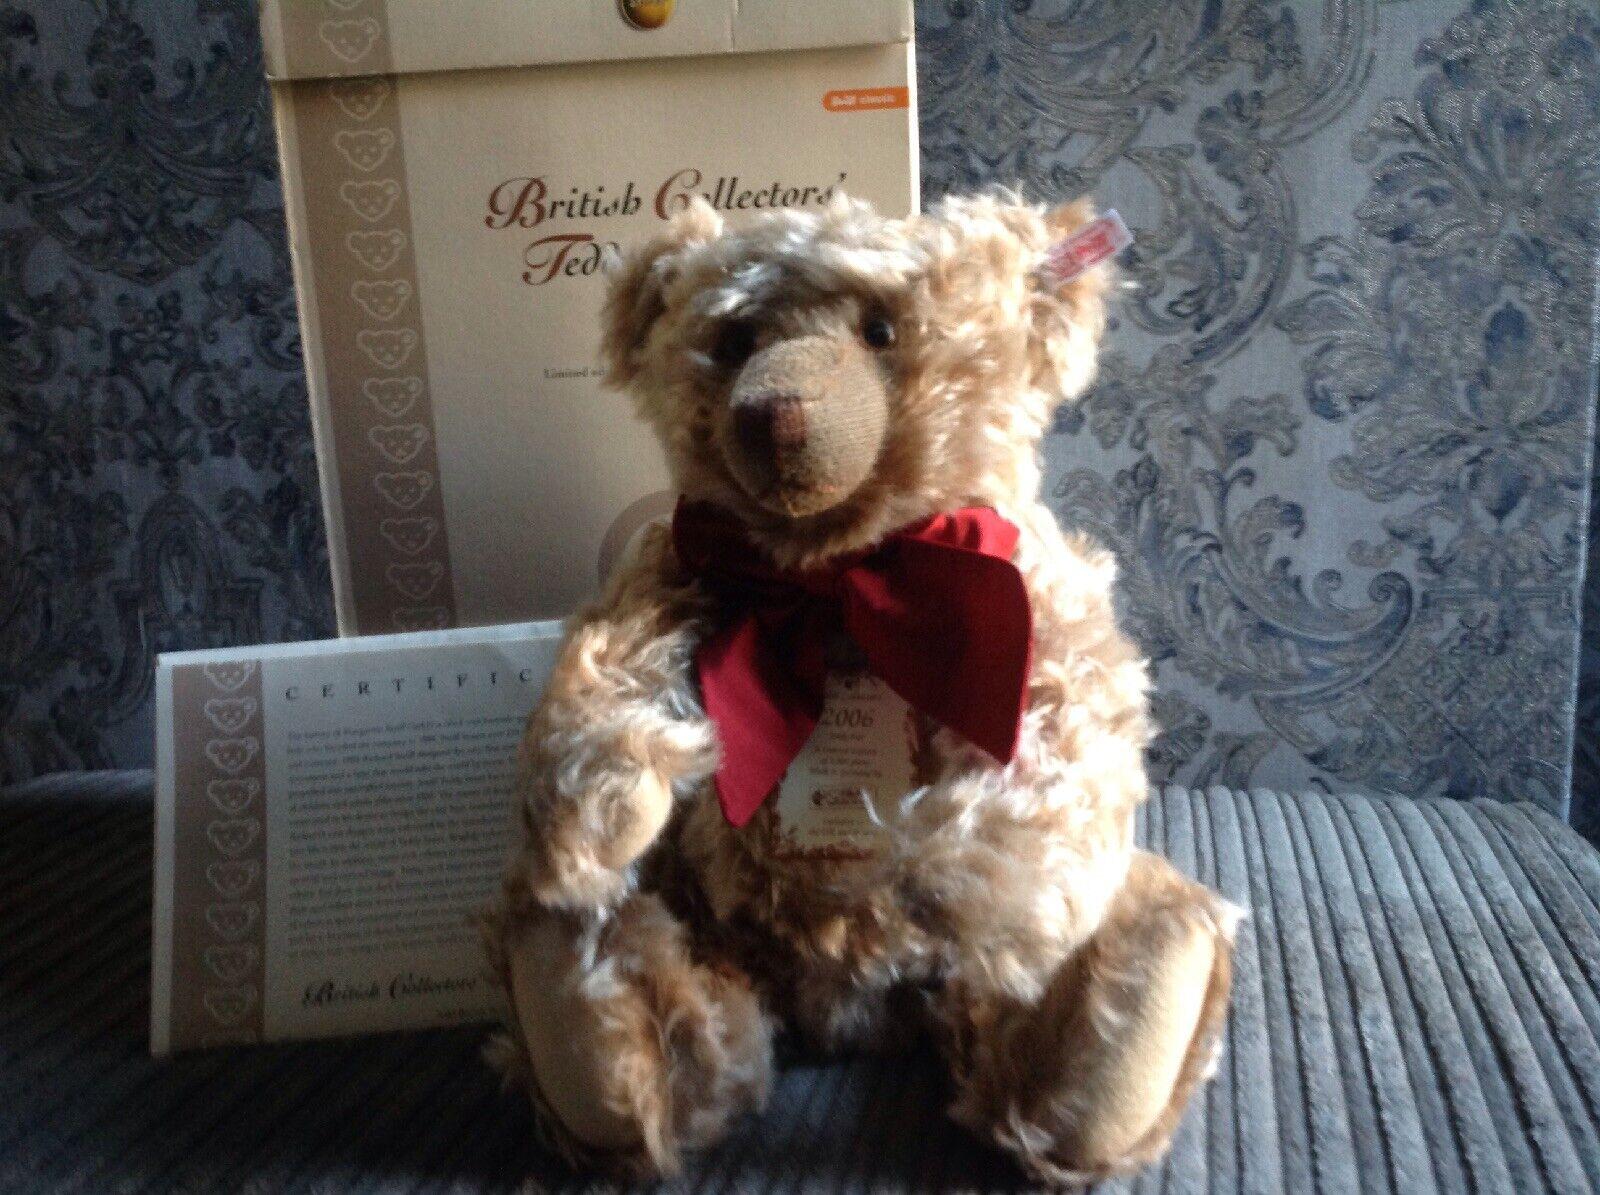 Steiff British Collectors Bear 2006, Old braun Bear.